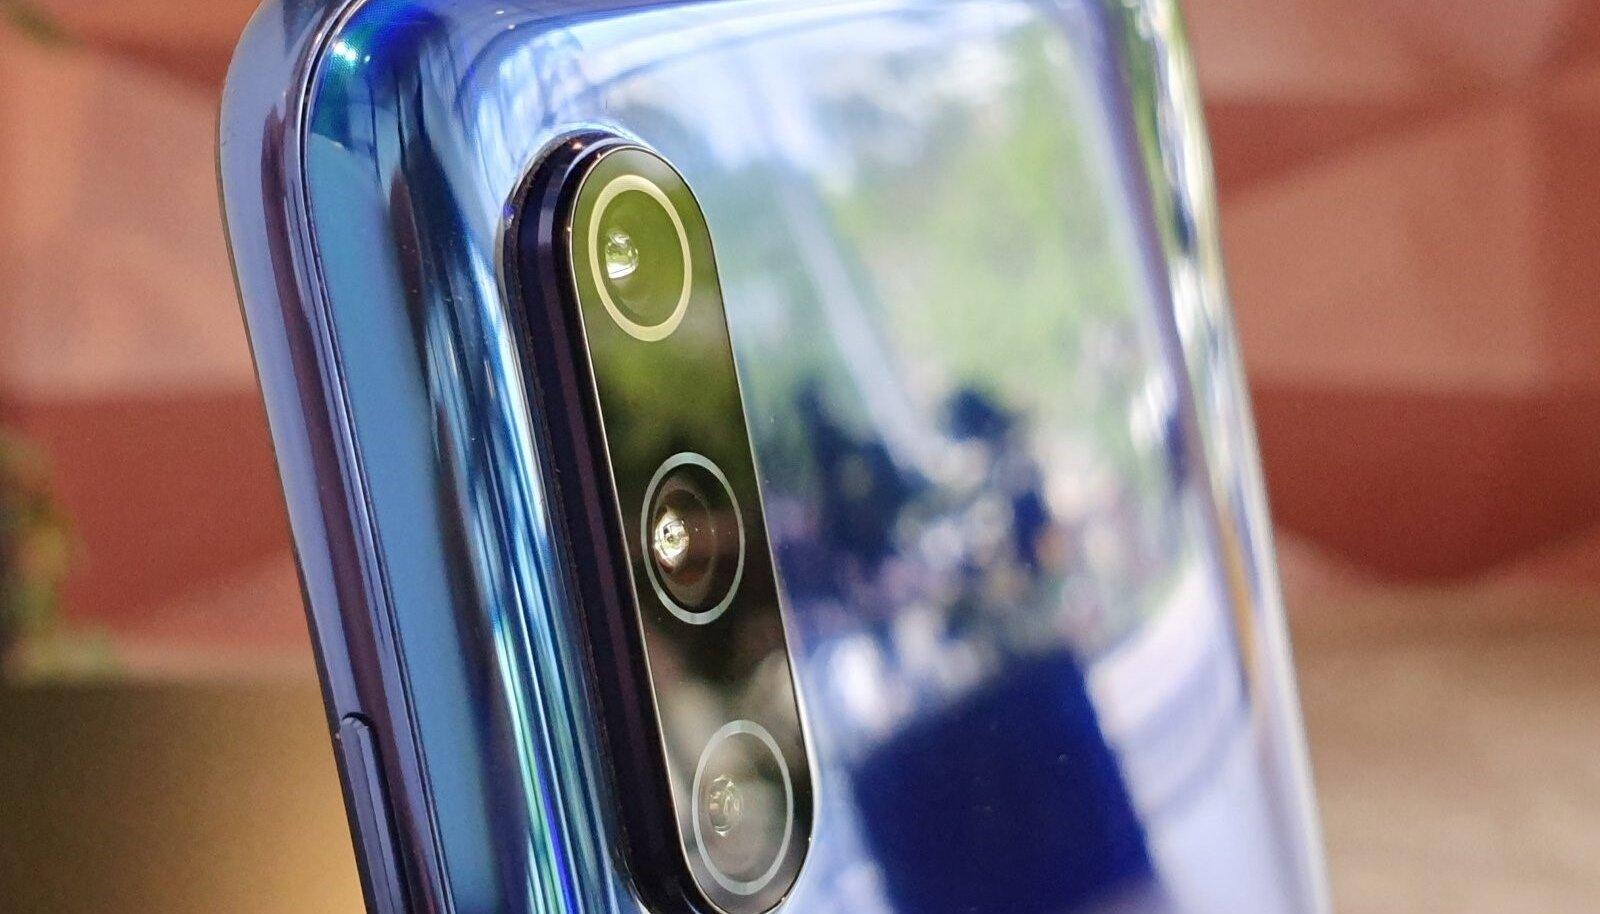 Eelmise aasta lõpus kandis kaitseministeerium Xiaomi musta nimekirja.